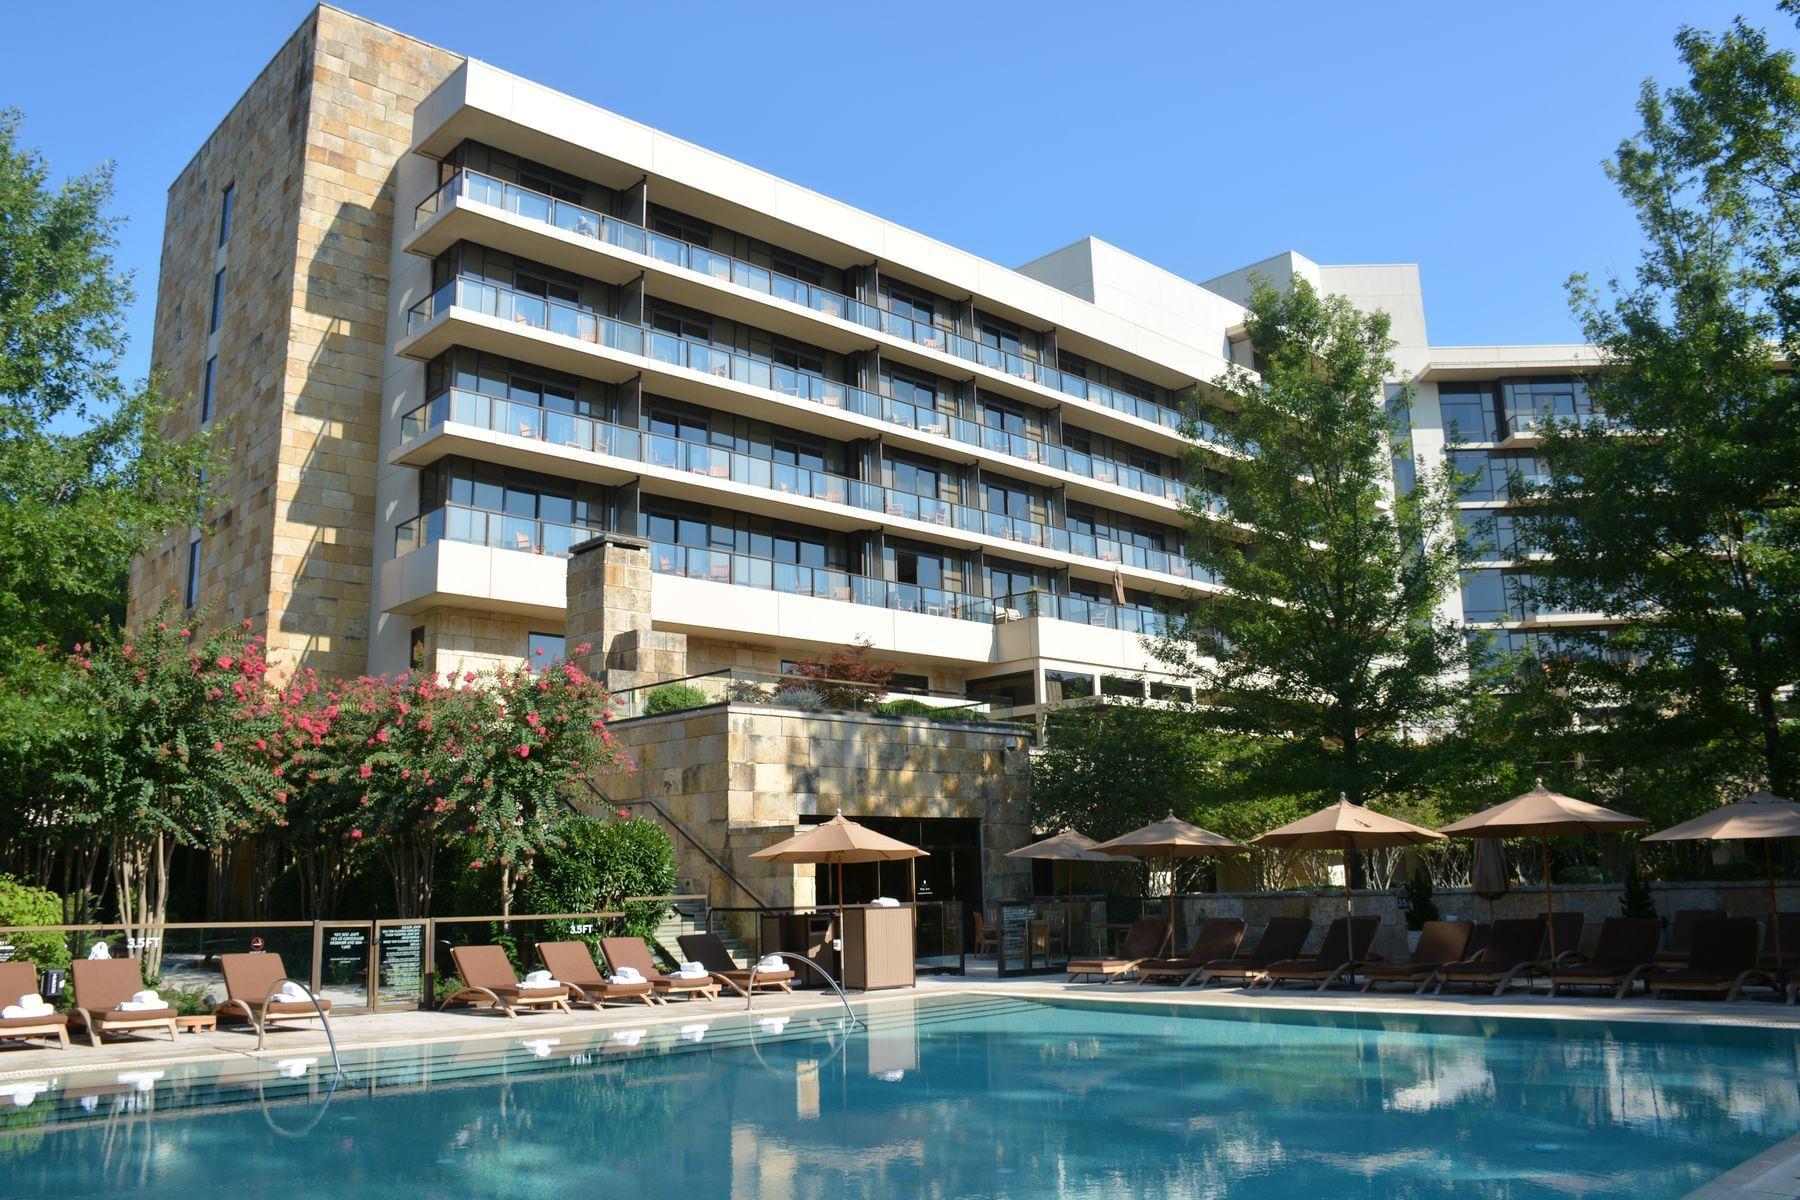 poolside of hotel